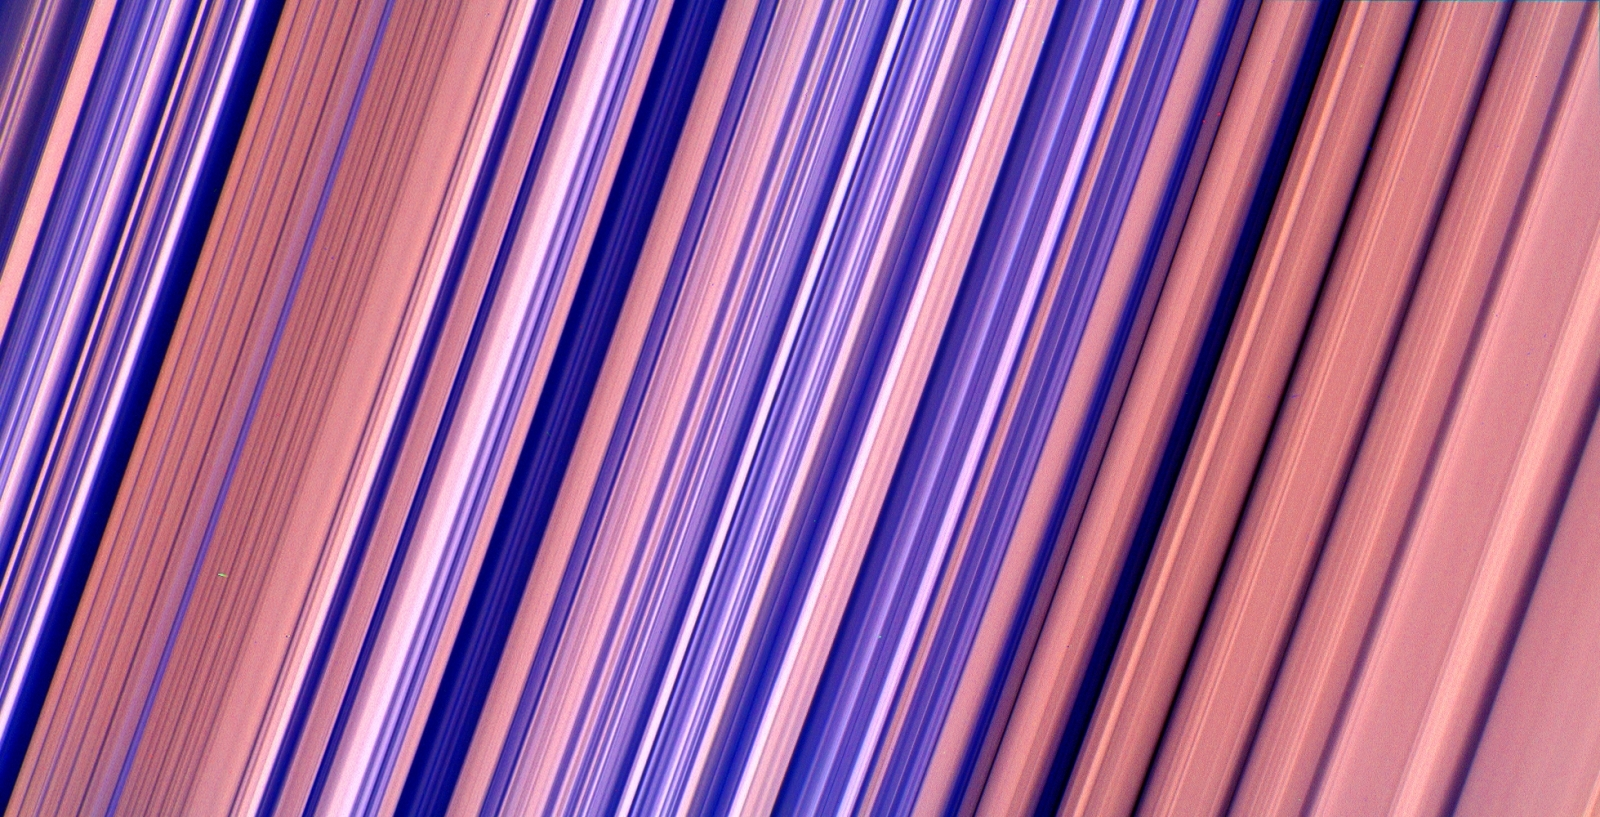 Enhanced colour image